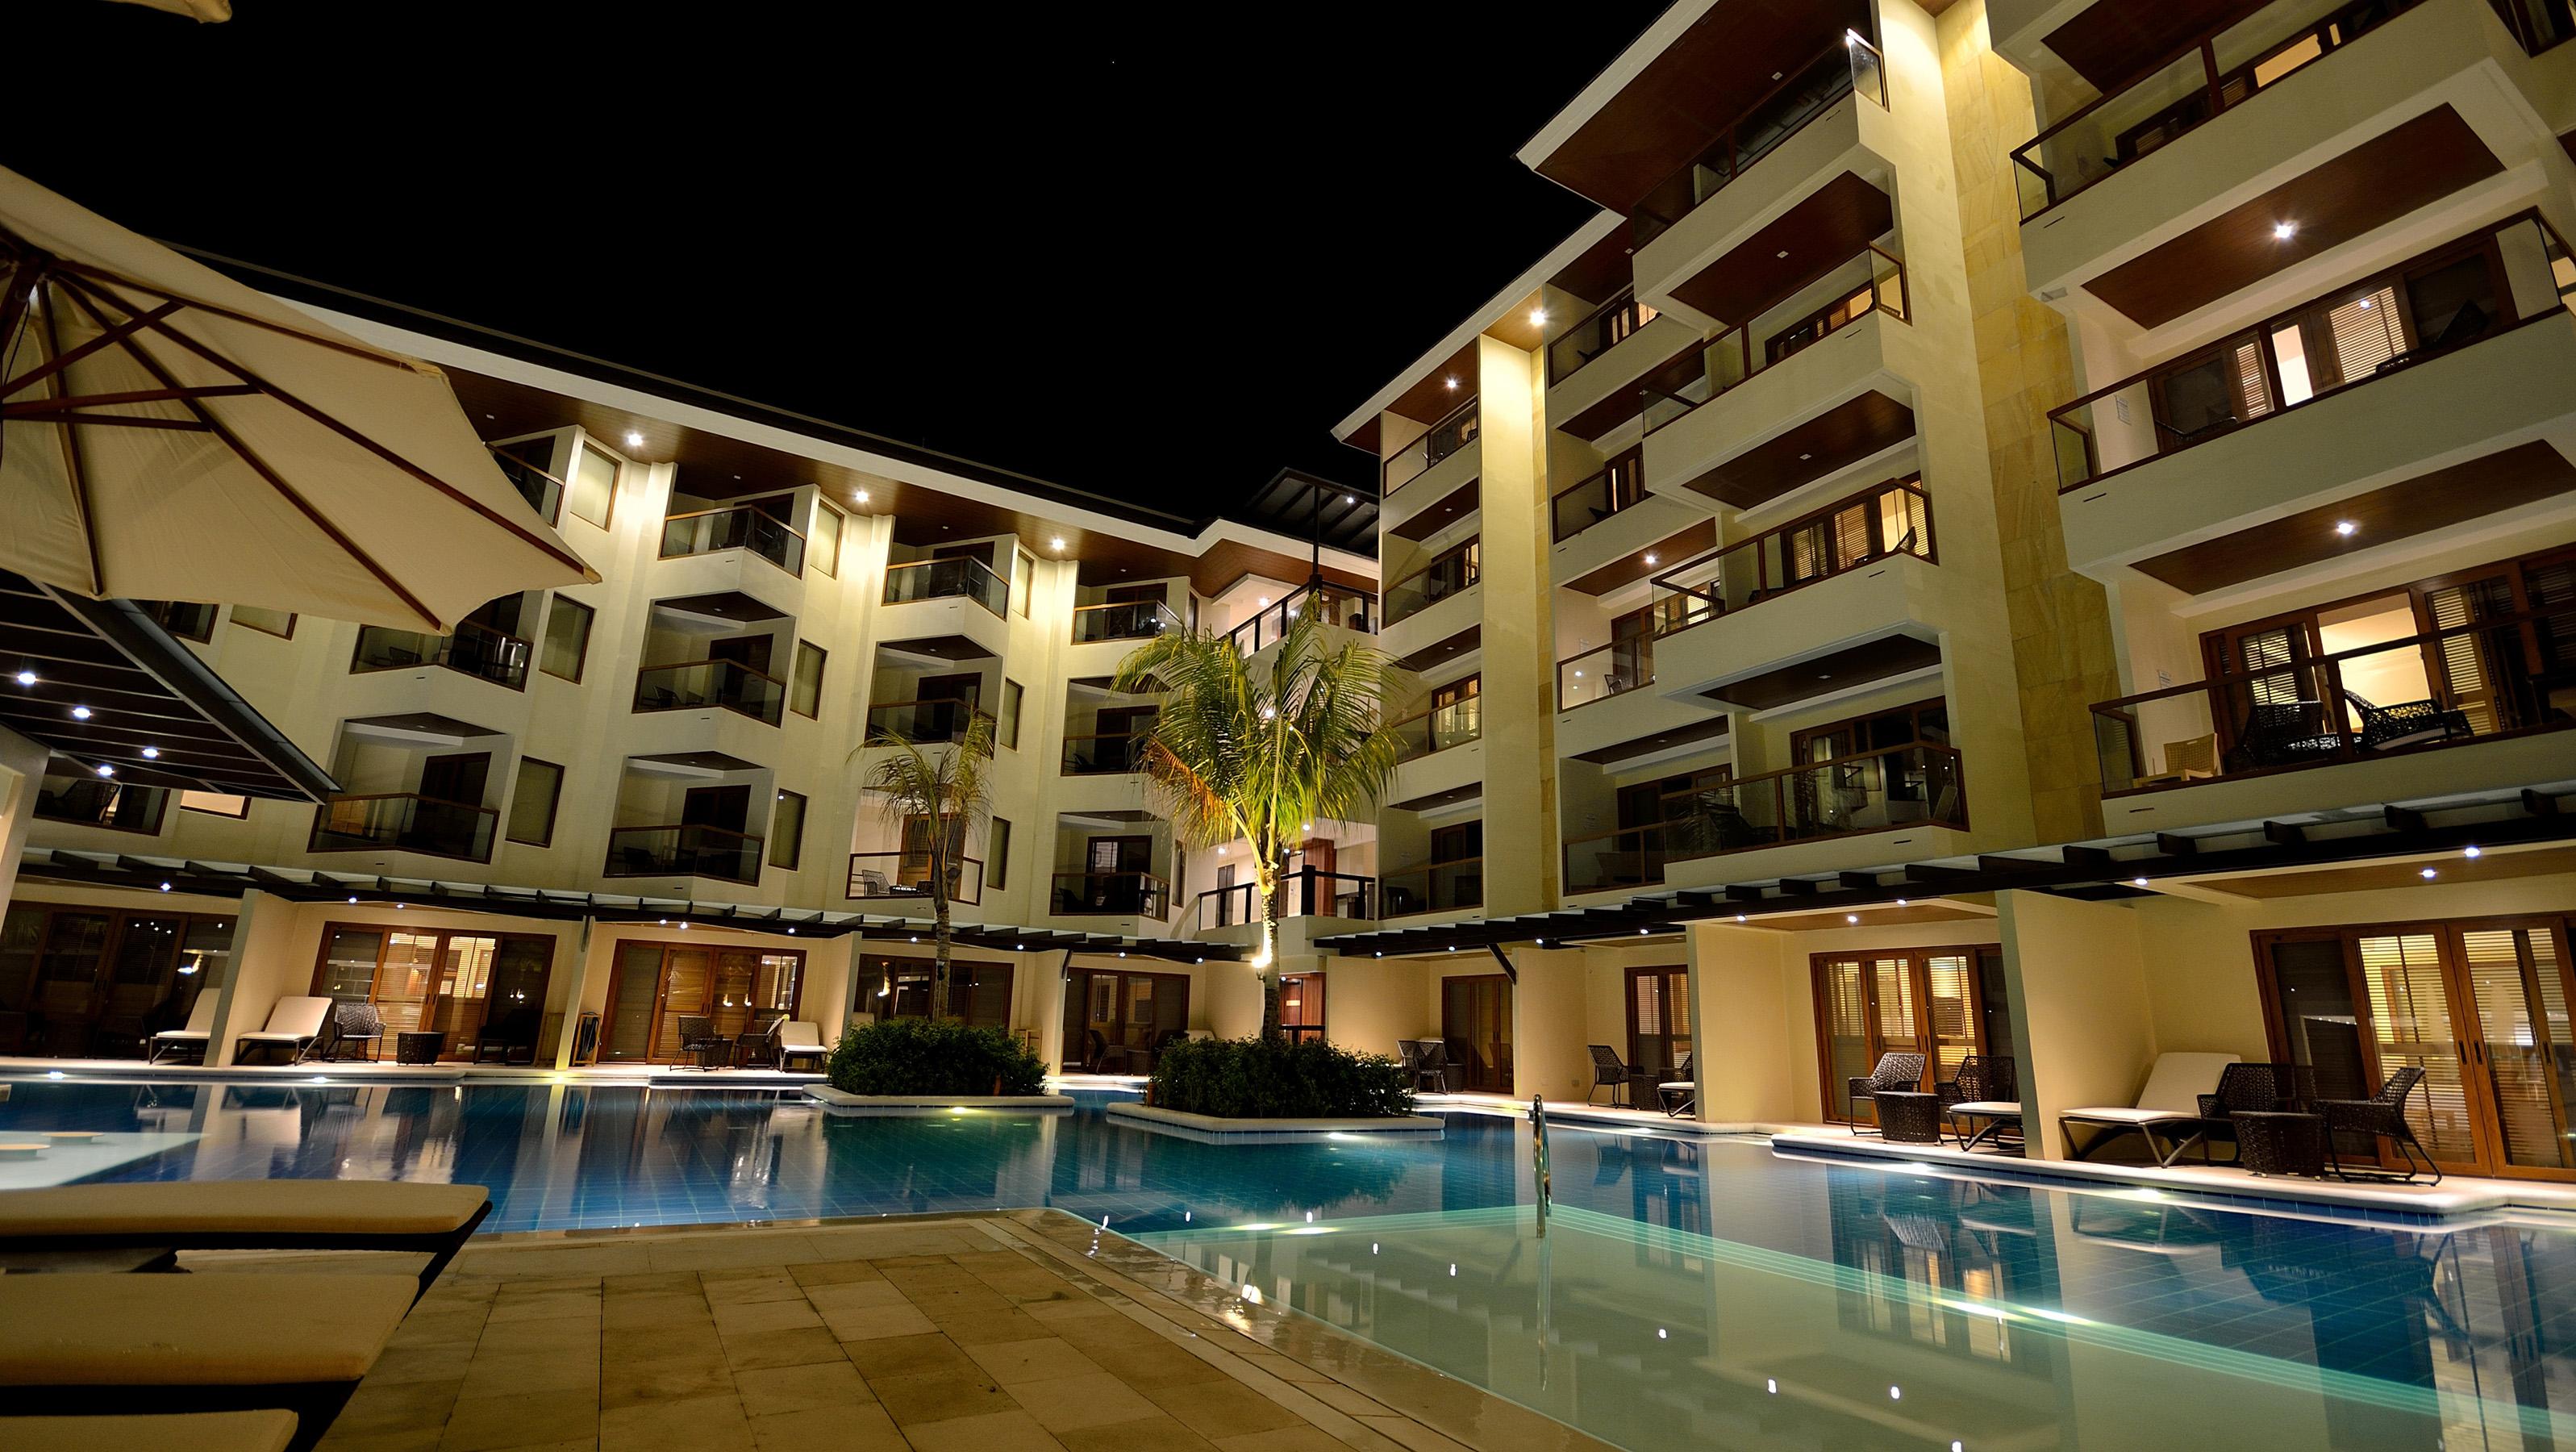 4T/3N Henann Resort Alona